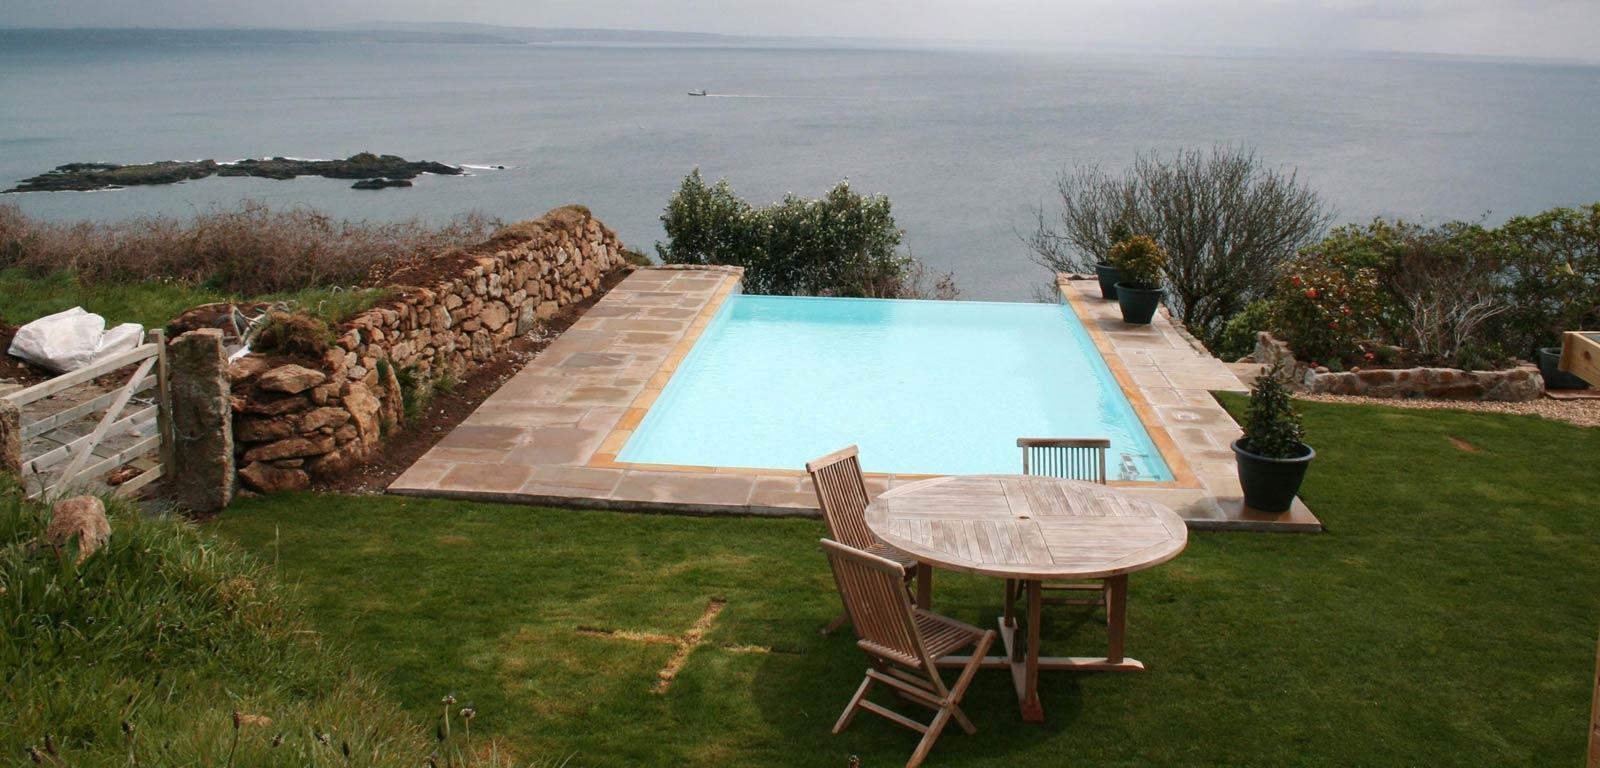 Piscine in giardino piscine castiglione for Piscine 10x5